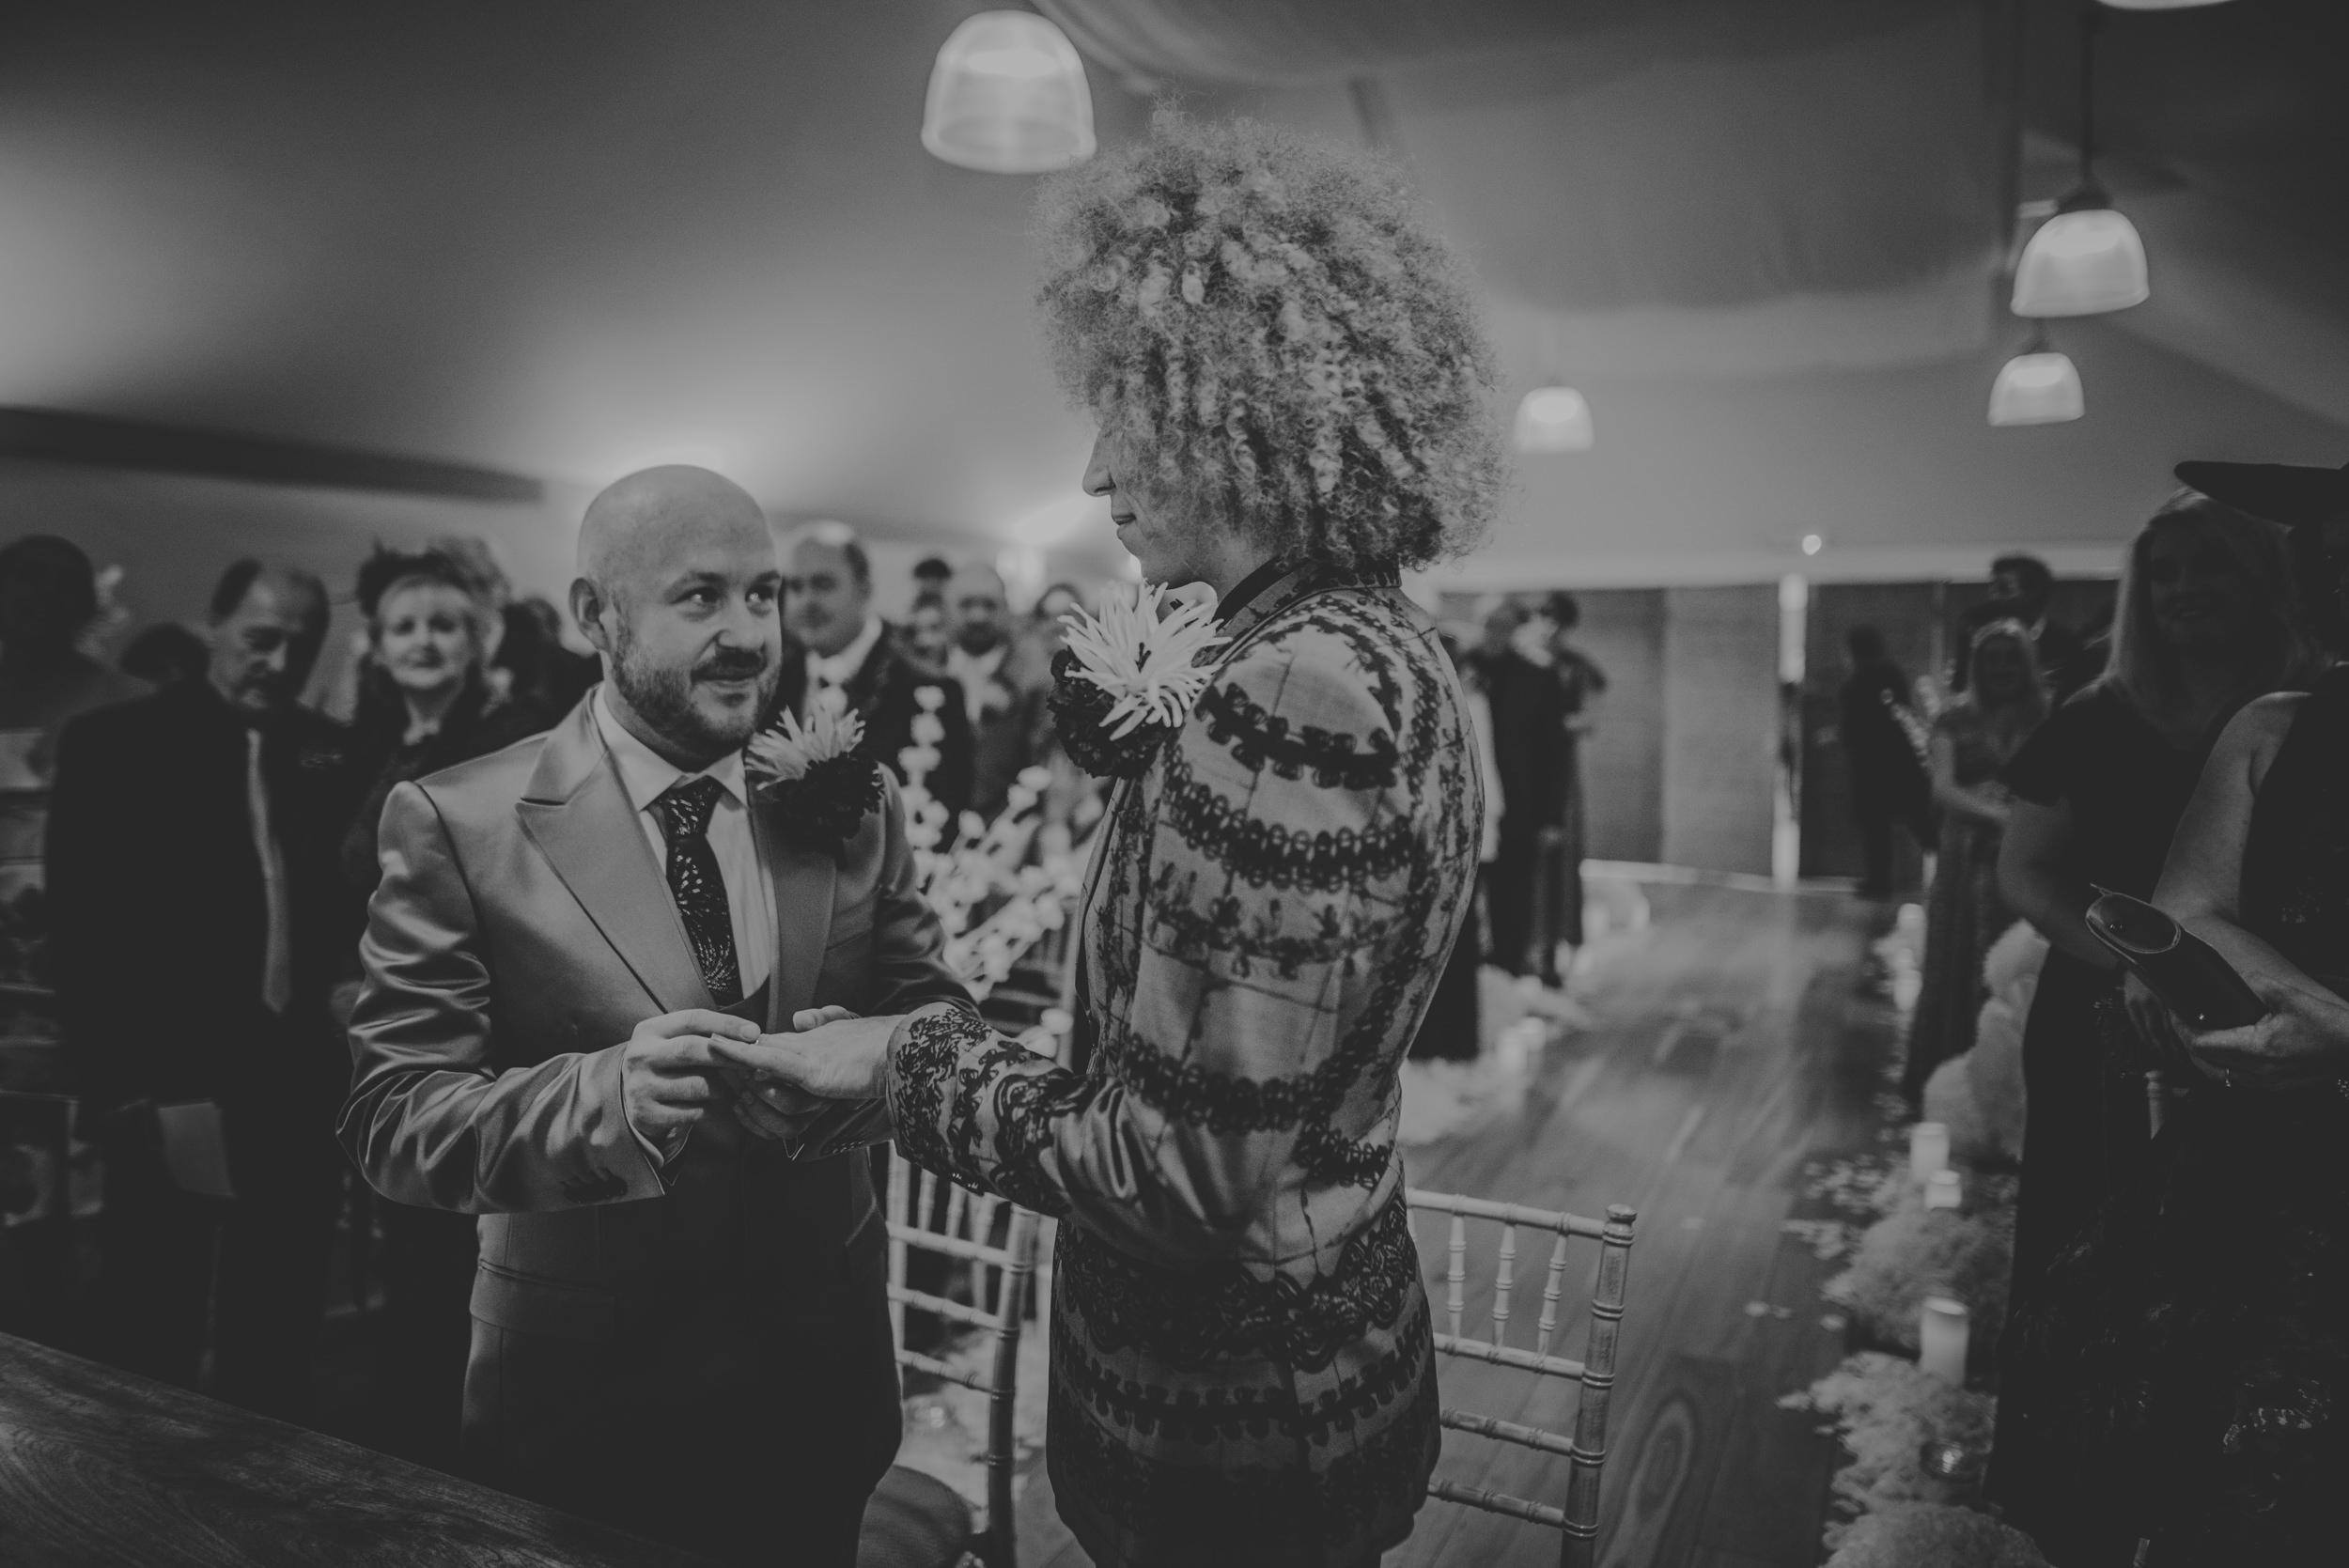 Barry-and-Chaz-wedding-Wasing-Park-Berkshire-Manu-Mendoza-Wedding-Photography-192.jpg